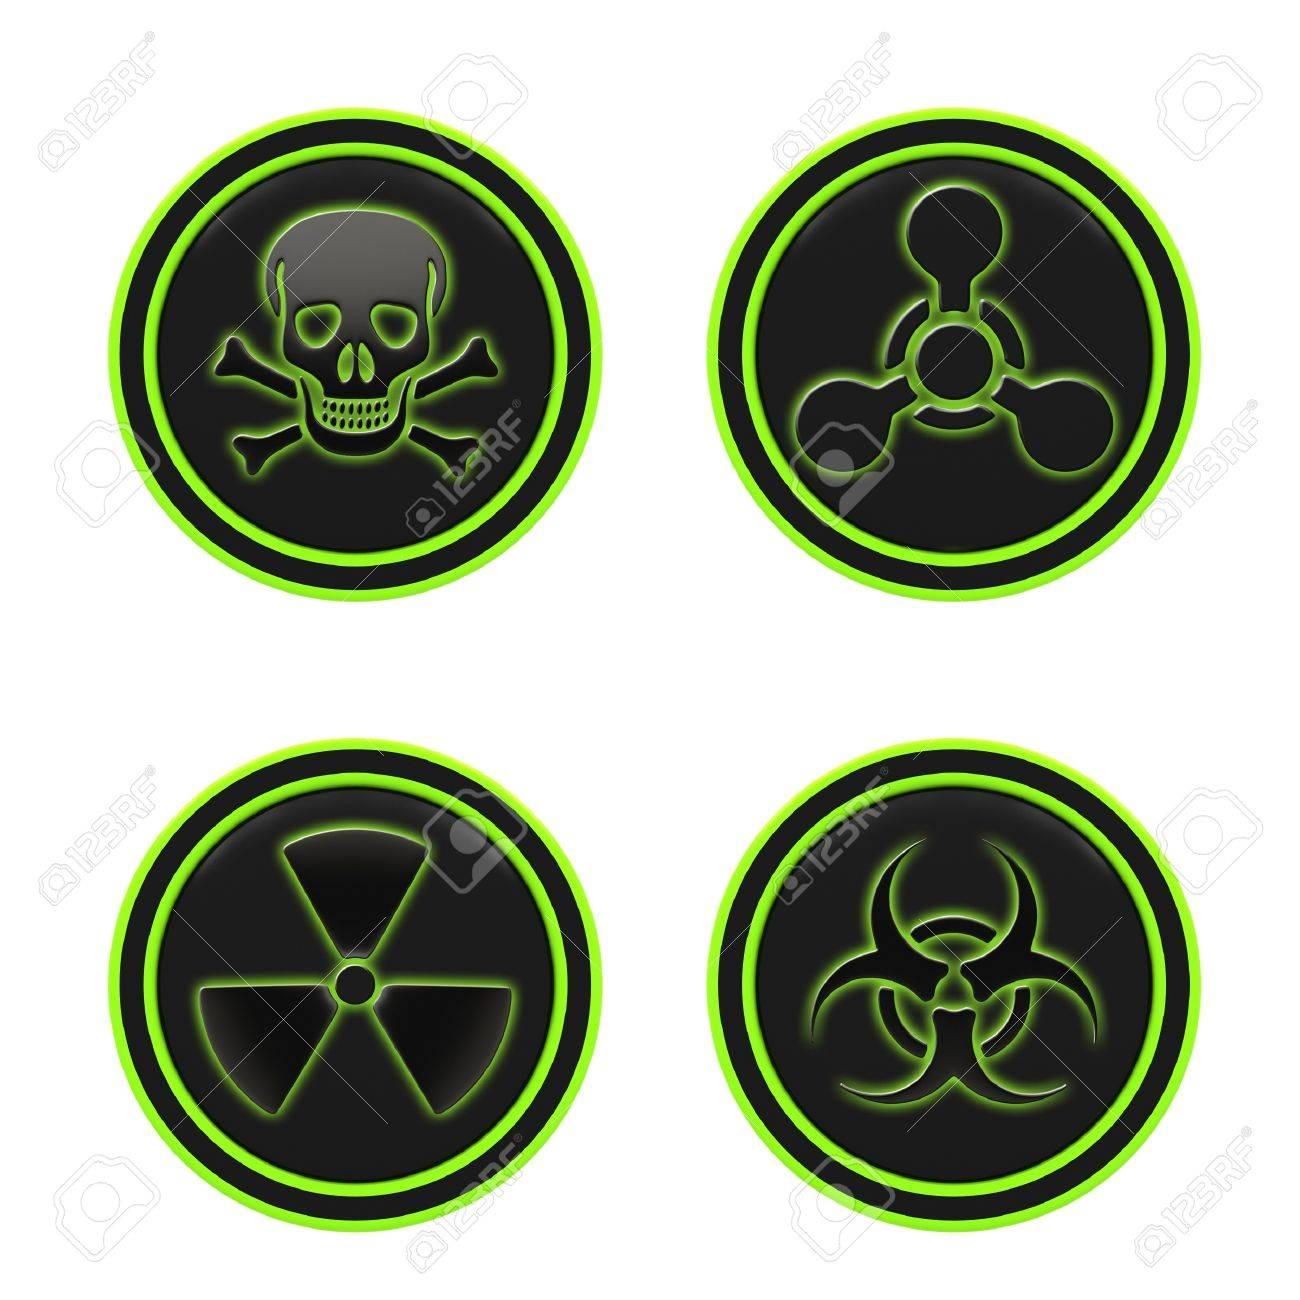 Icon depicting the hazard symbols on a white background. Stock Photo - 12313341